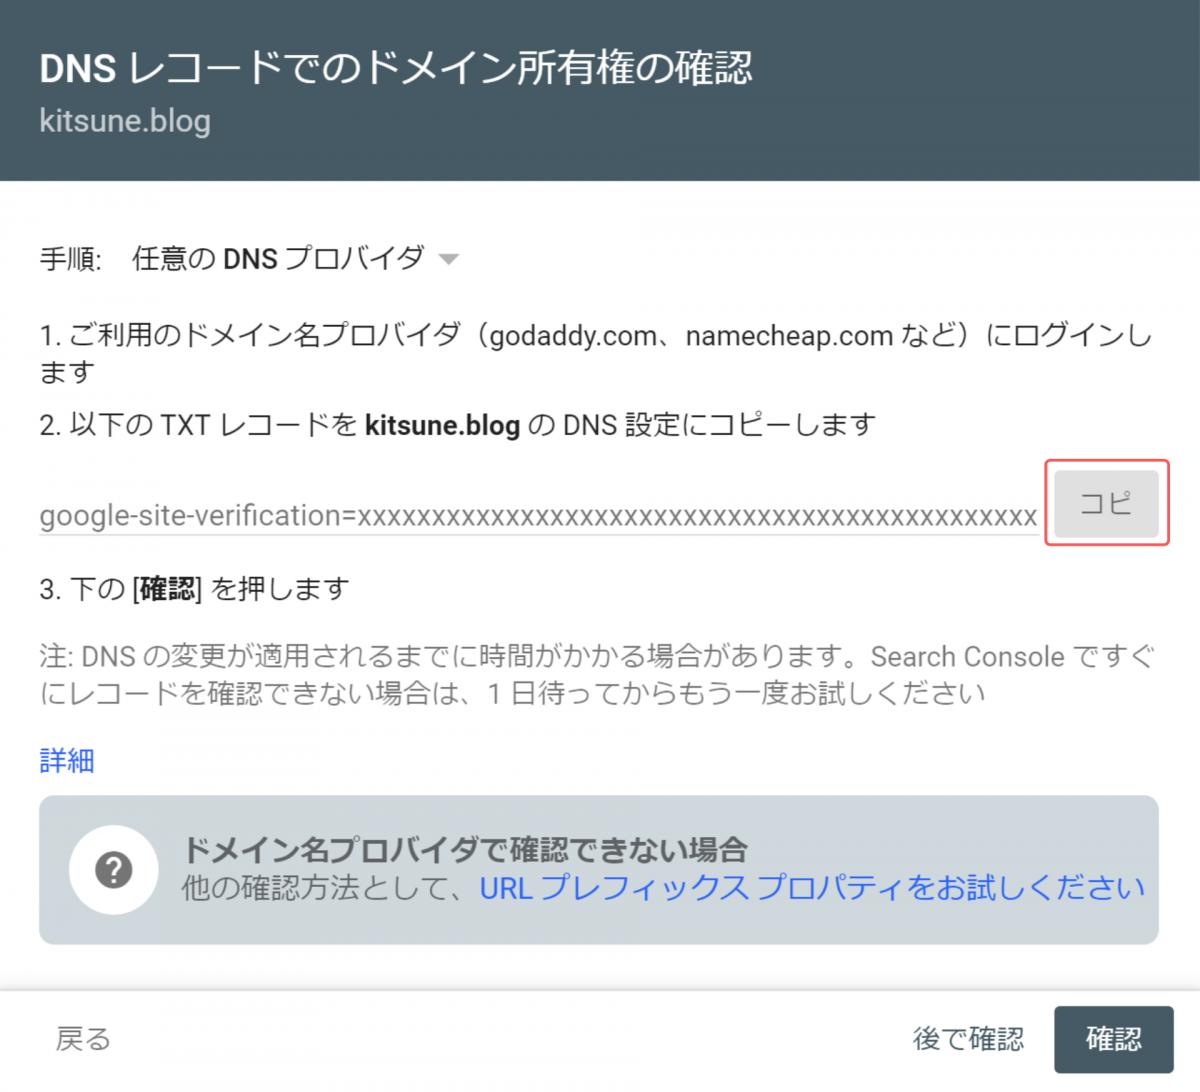 【Search Console】DNSレコード確認画面